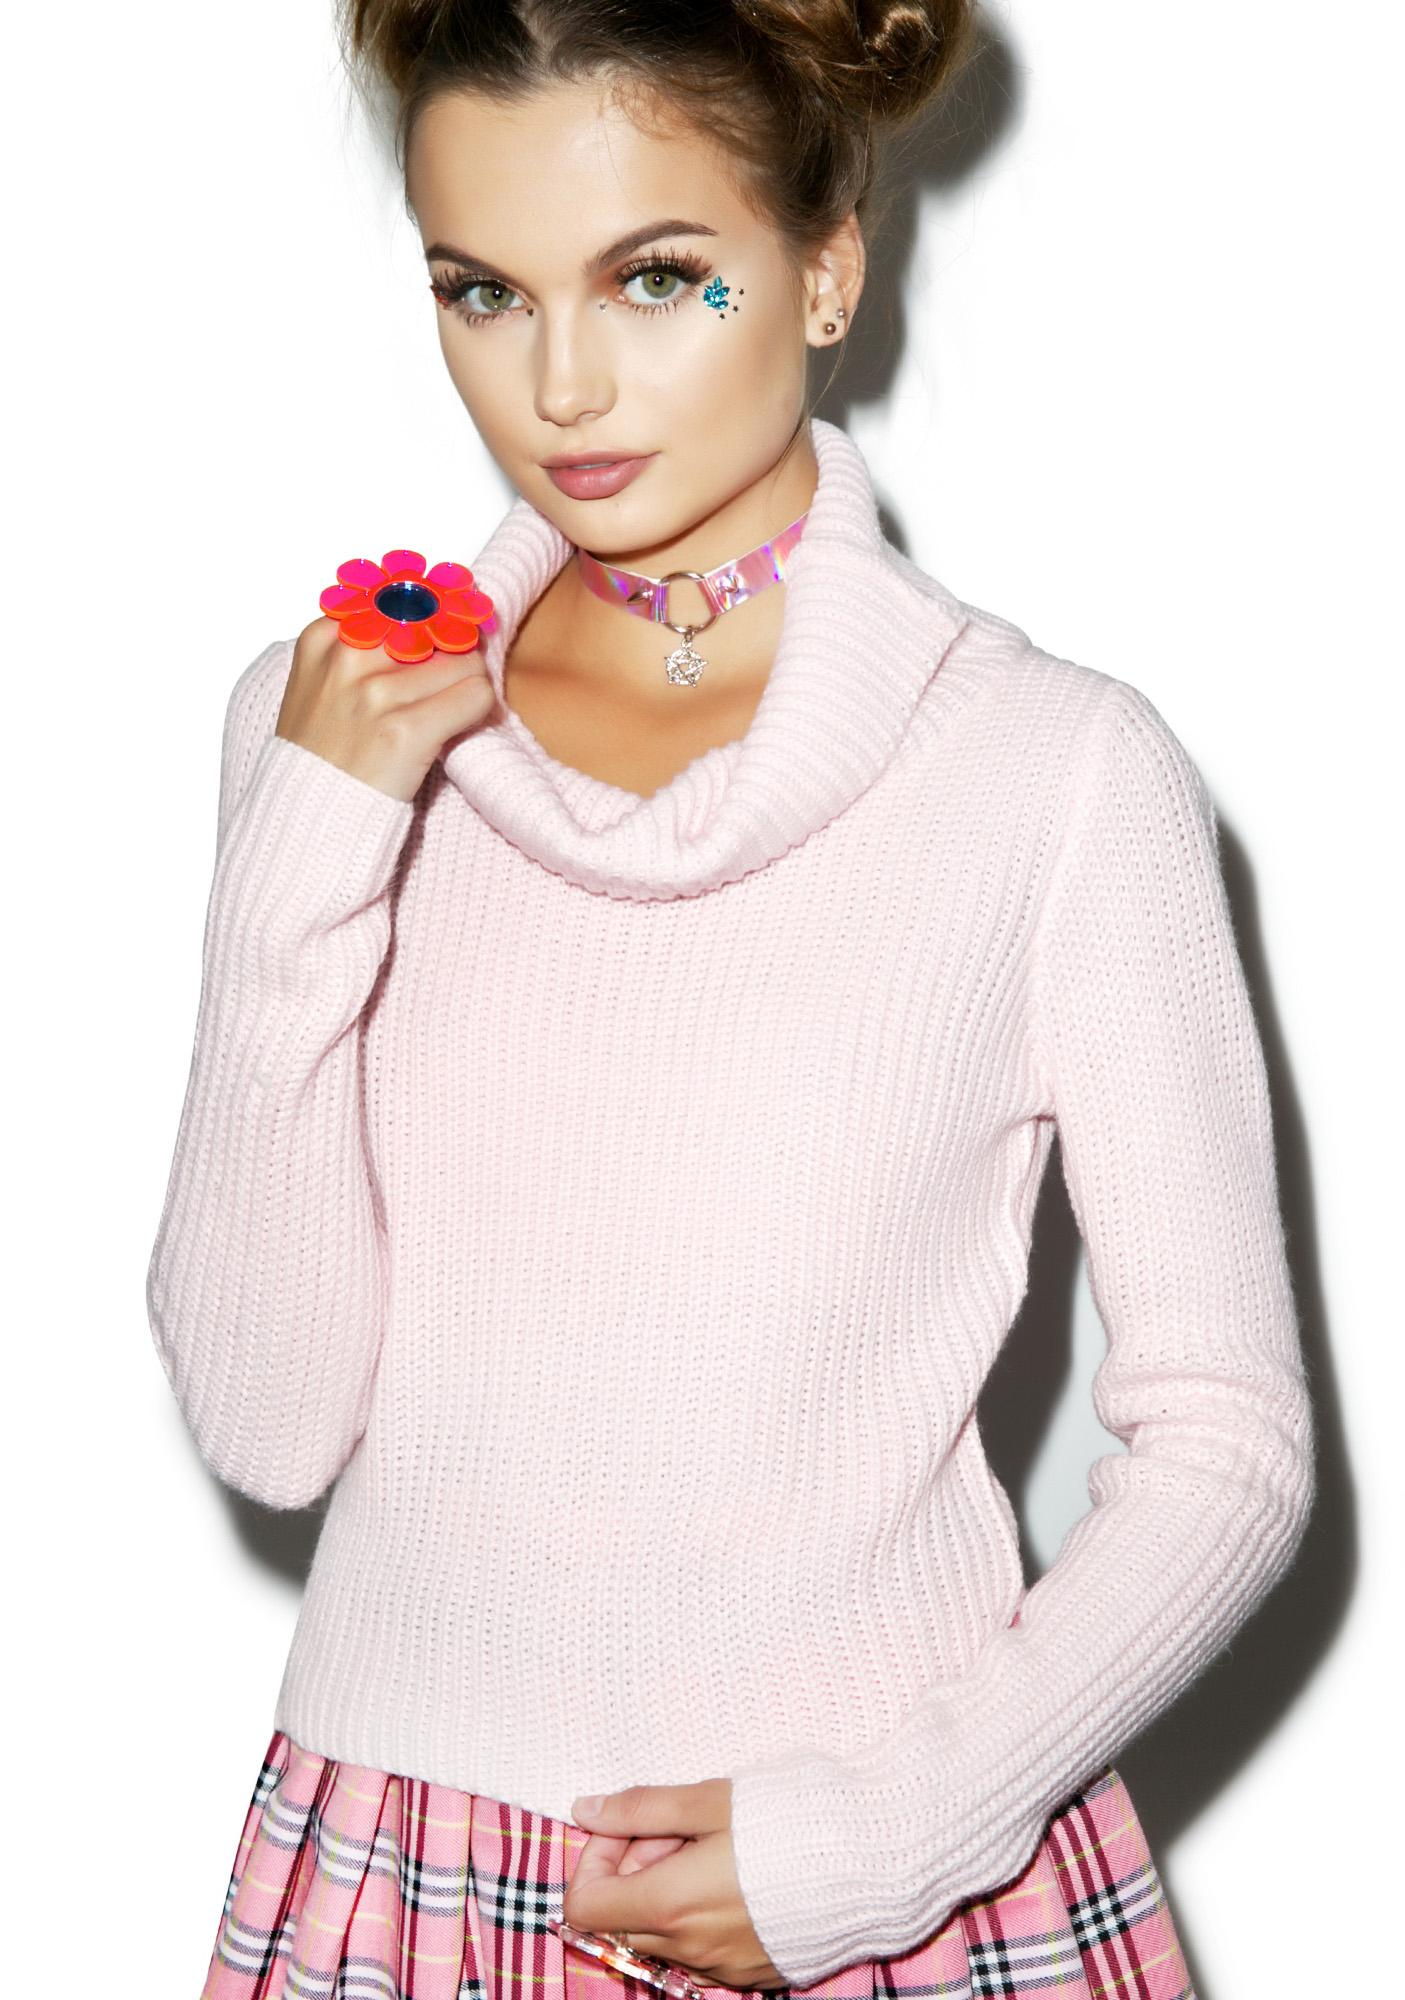 Tiger Mist Princess Amelia Sweater